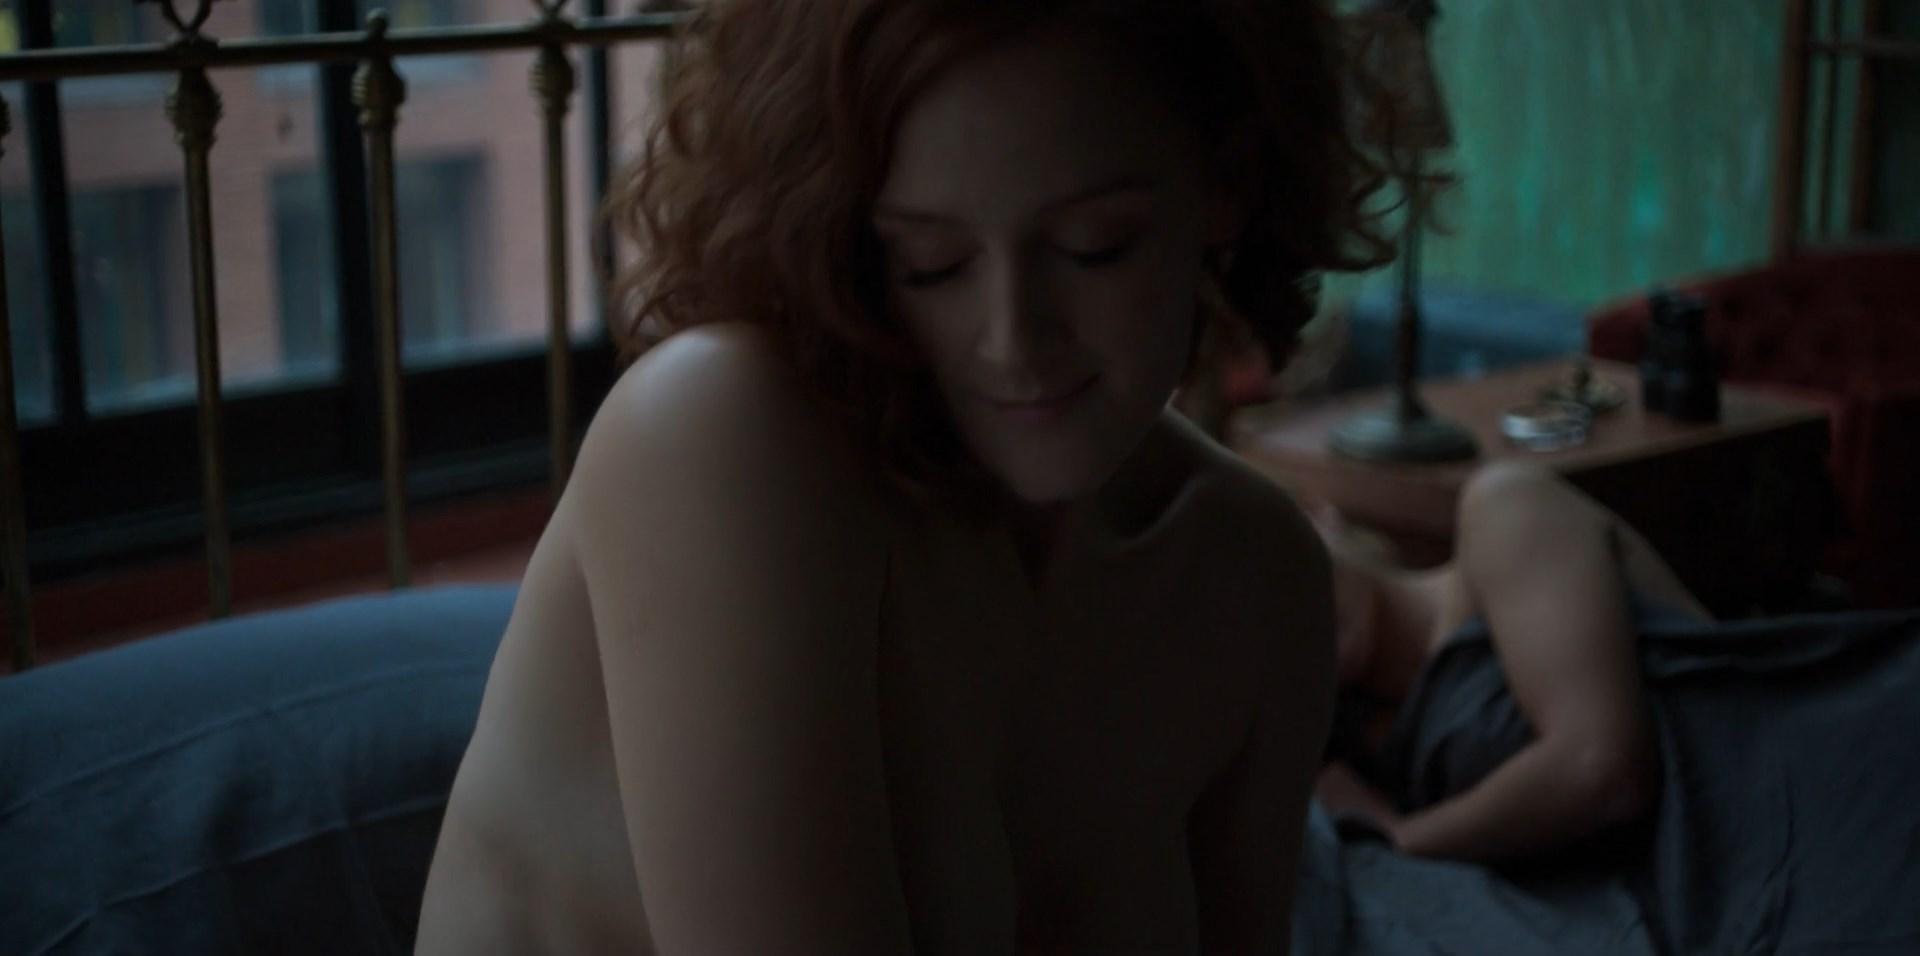 Ana Polvorosa Nude watch online - ana maria polvorosa, ana fernandez - cable